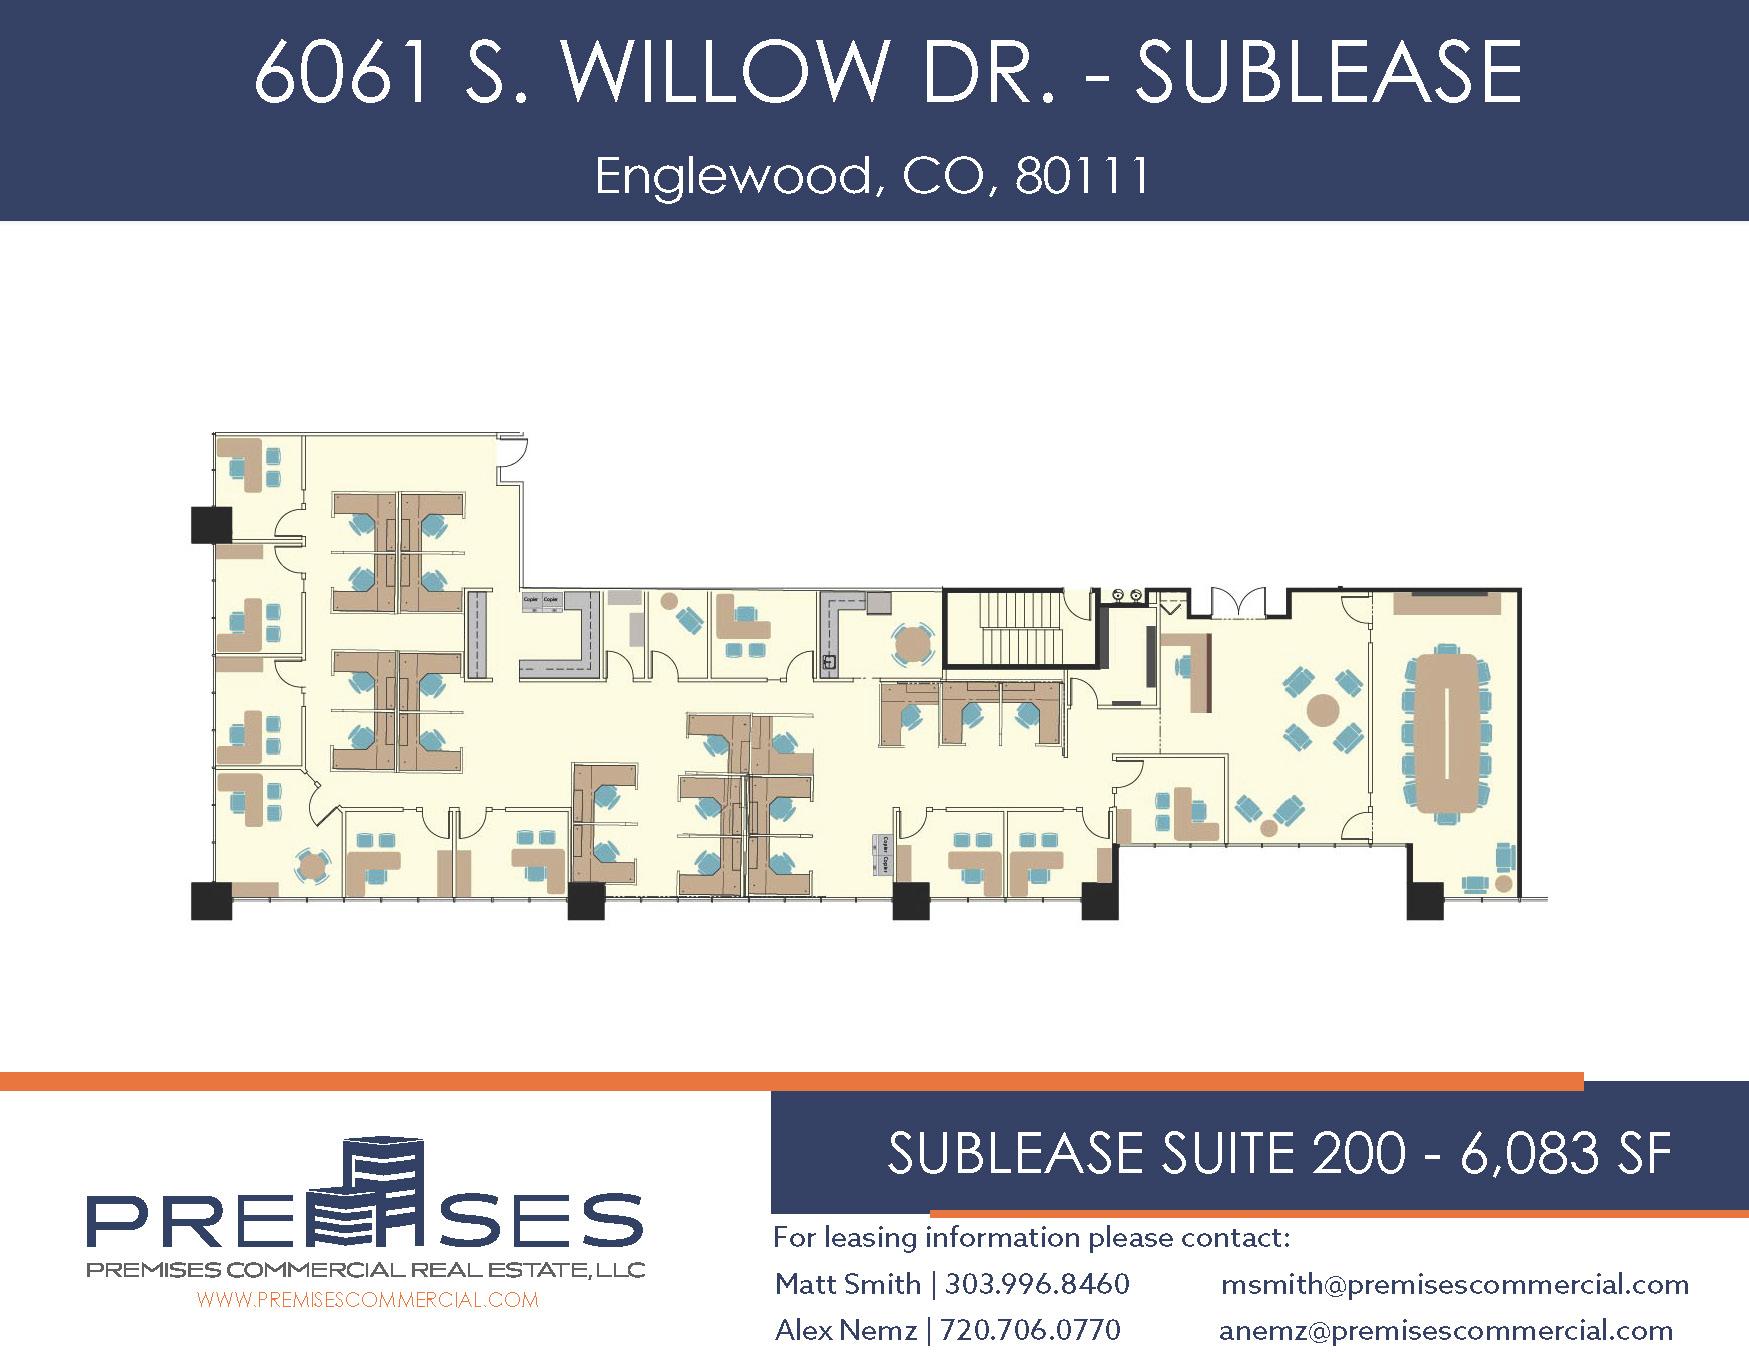 Suite 200 - 6,083 SF